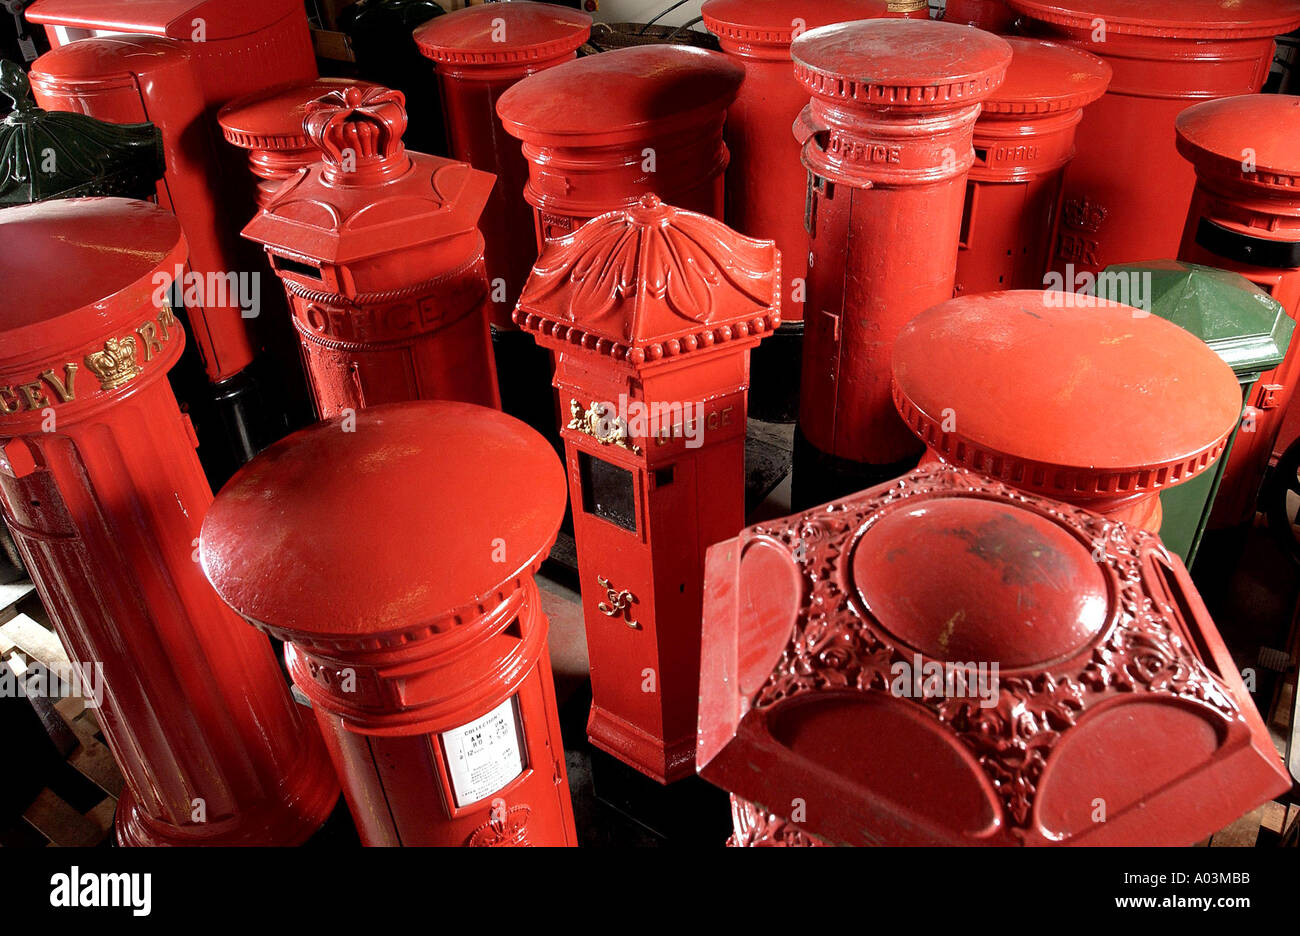 Historic pillar boxes in storage. - Stock Image